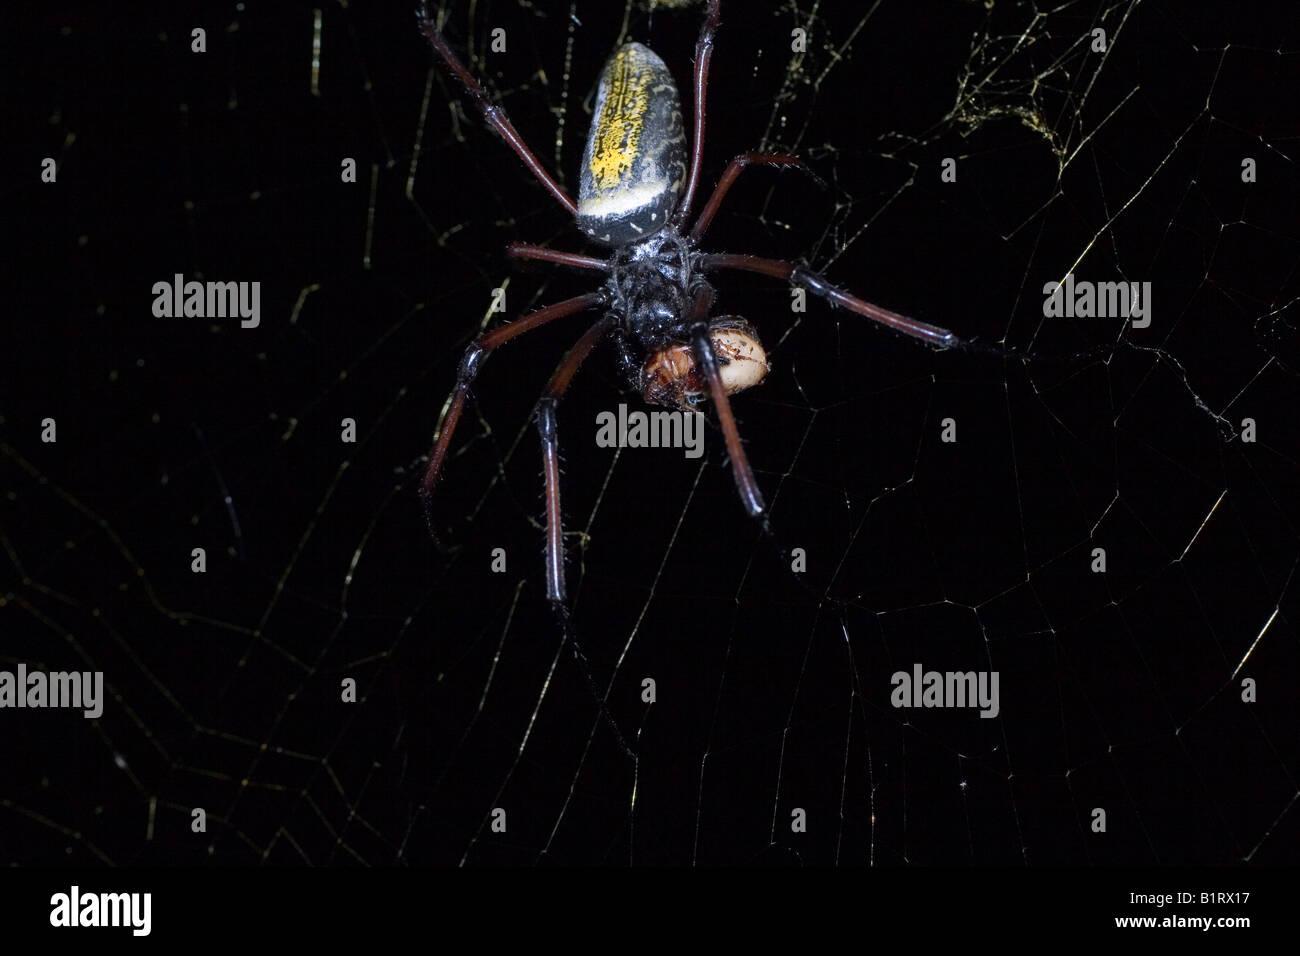 Golden Silk Orb-web or Orbweaver Spider (Nephila clavipes), Madagascar, Africa - Stock Image